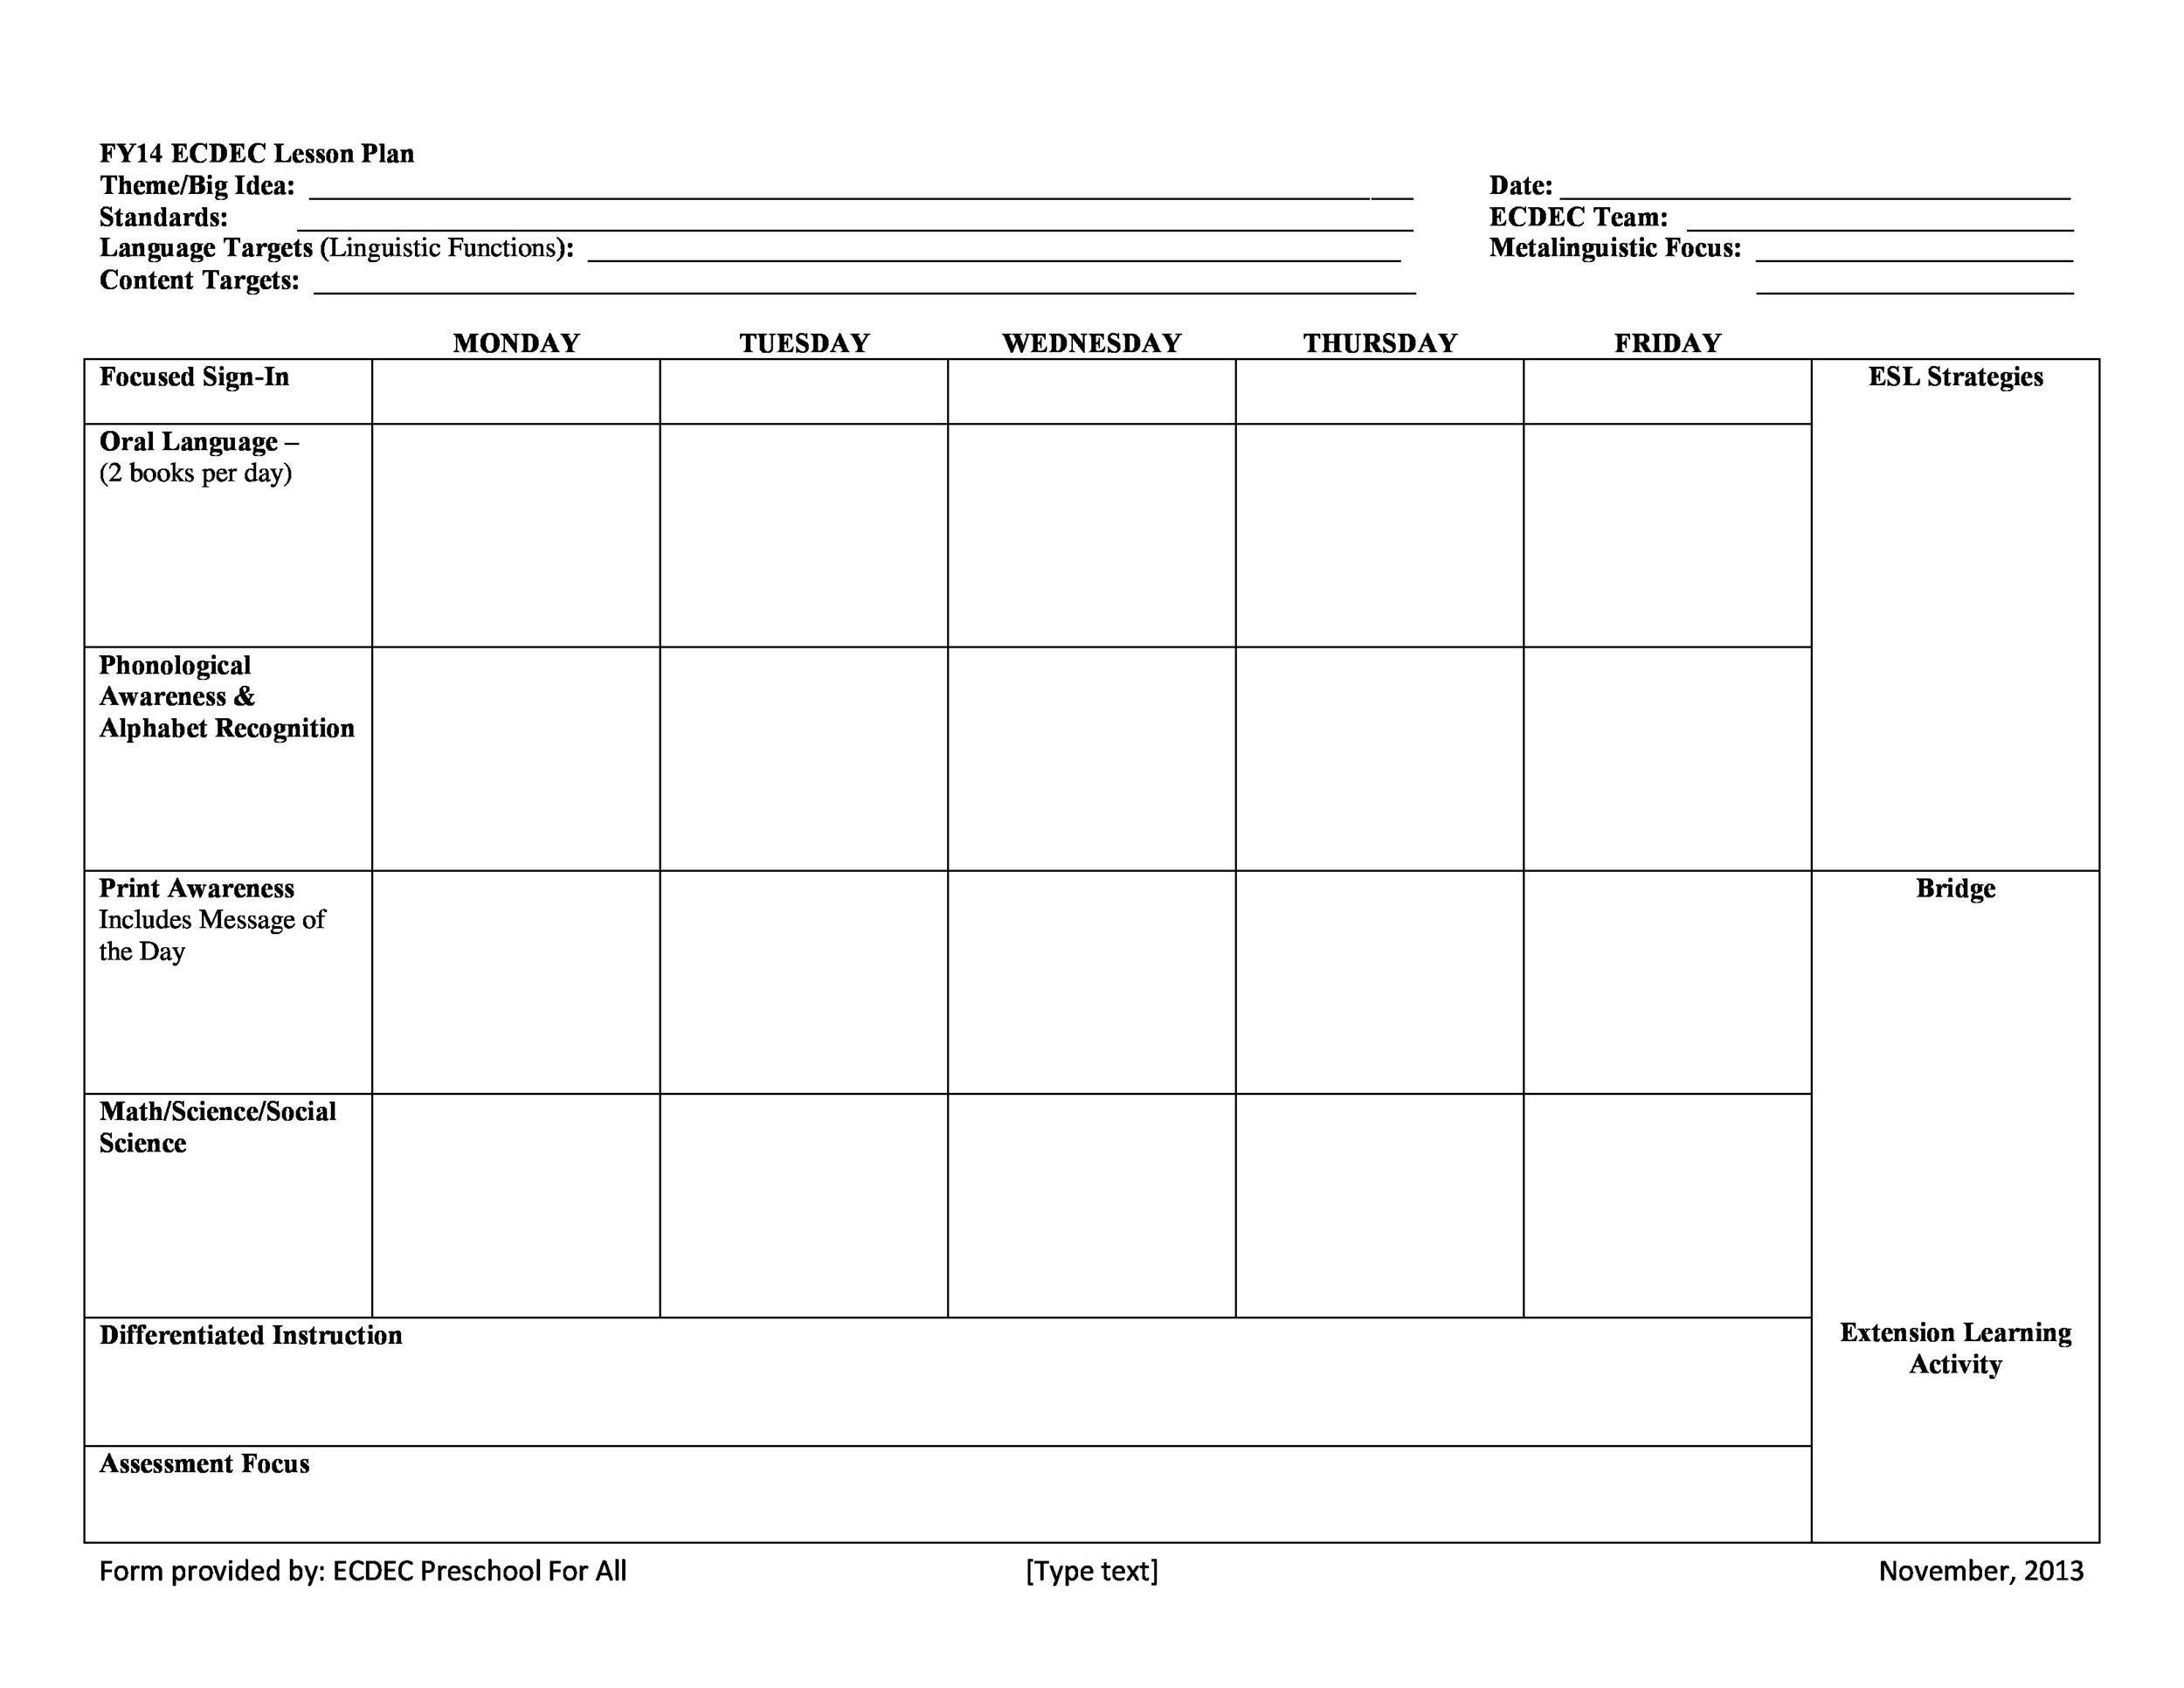 005 Impressive Free Printable Lesson Plan Template Example  Preschool Weekly For KindergartenFull